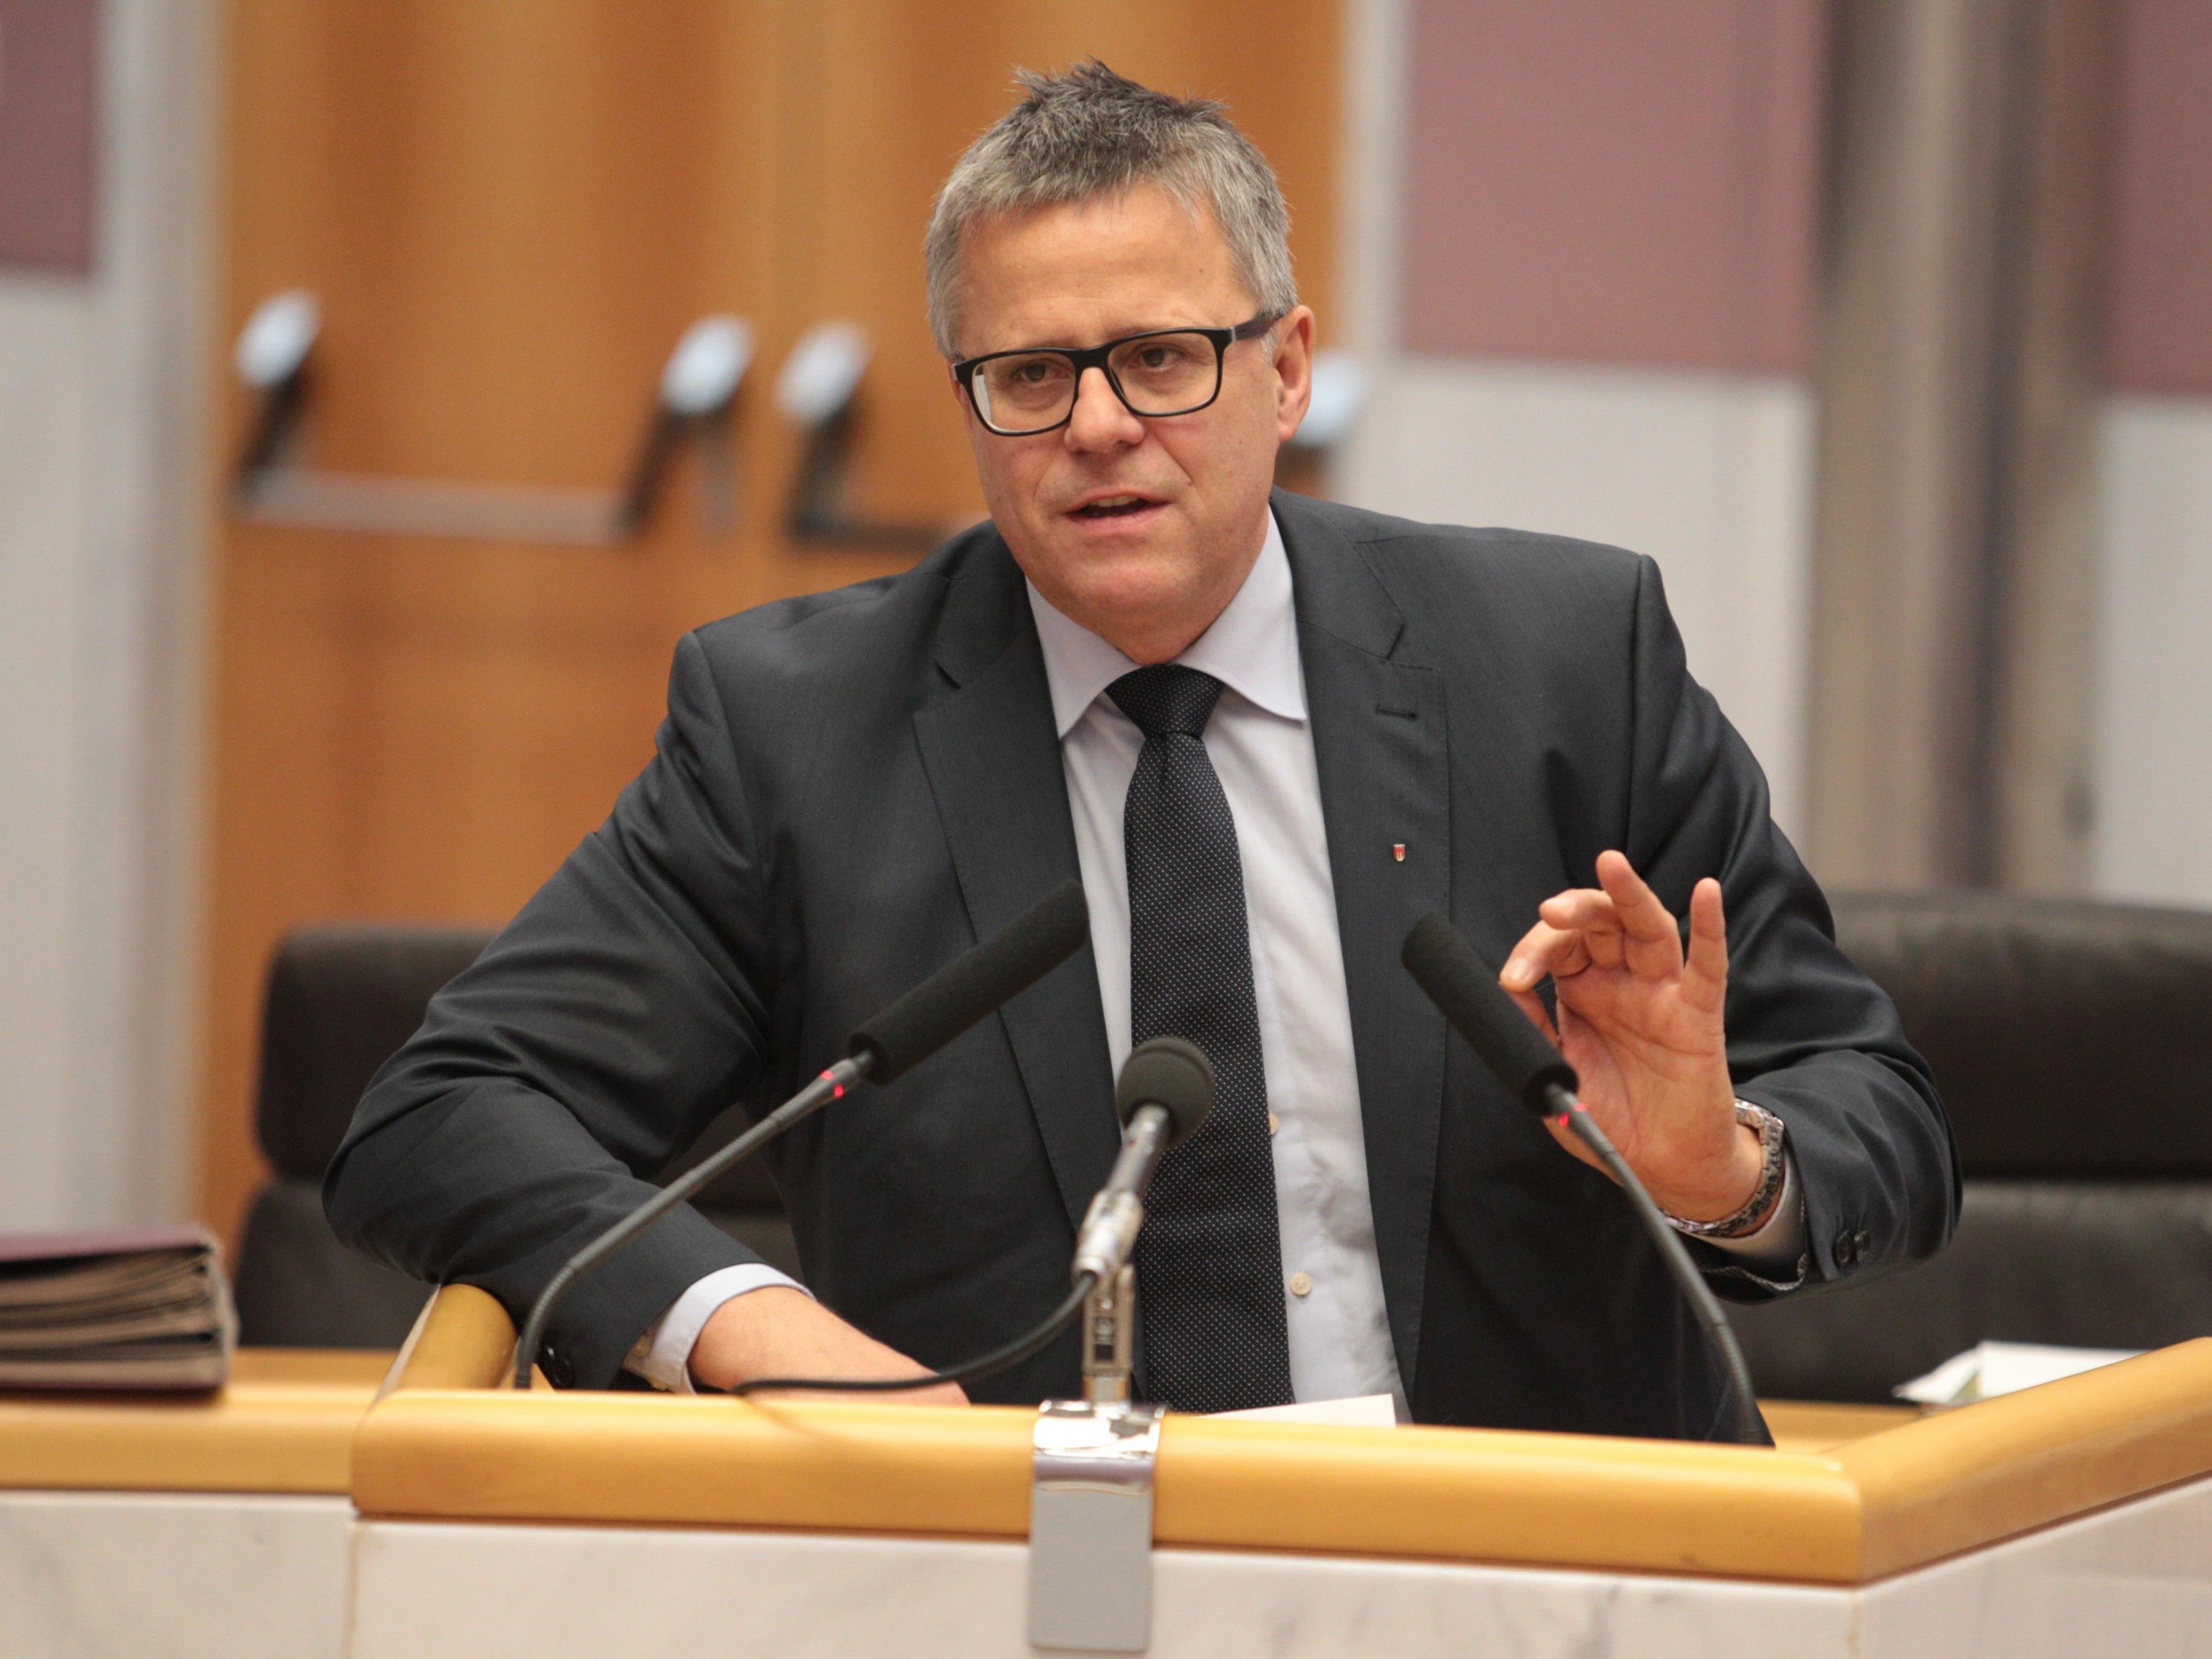 ÖVP-Klubobmann Roland Frühstück ortet bei der FPÖ Panik.